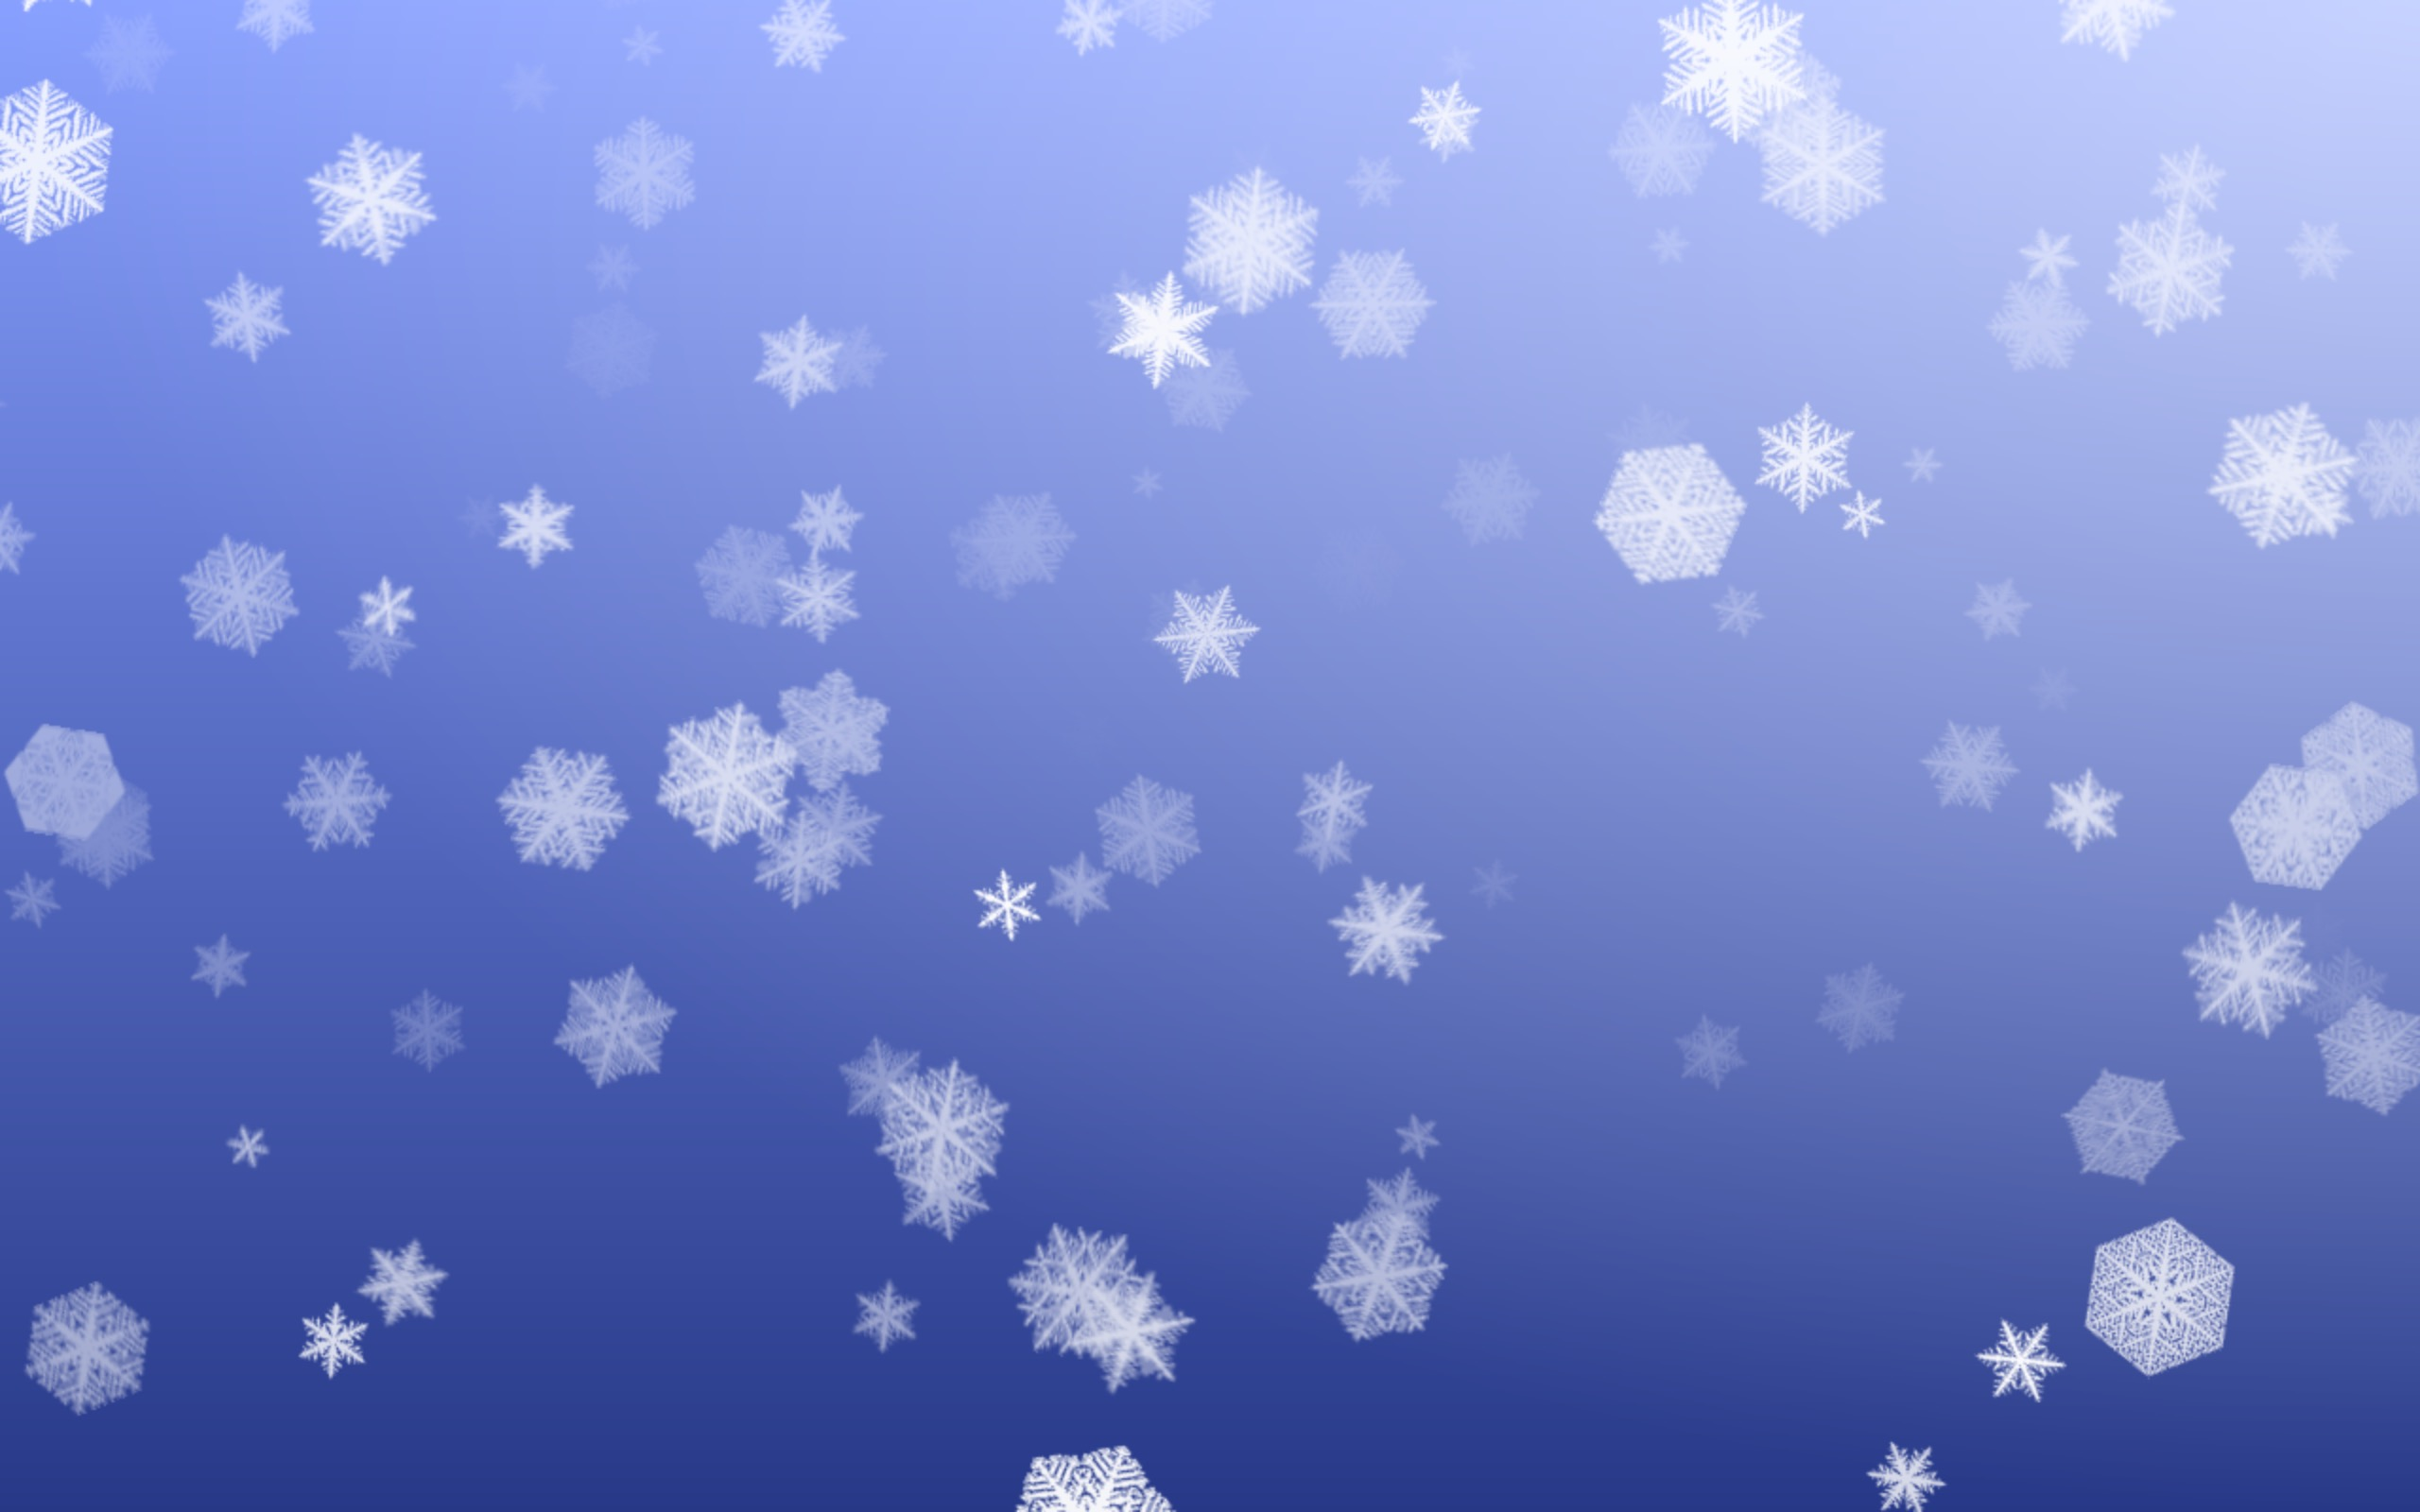 LotsaSnow - A Simple Falling Snow Screensaver for Mac OS X